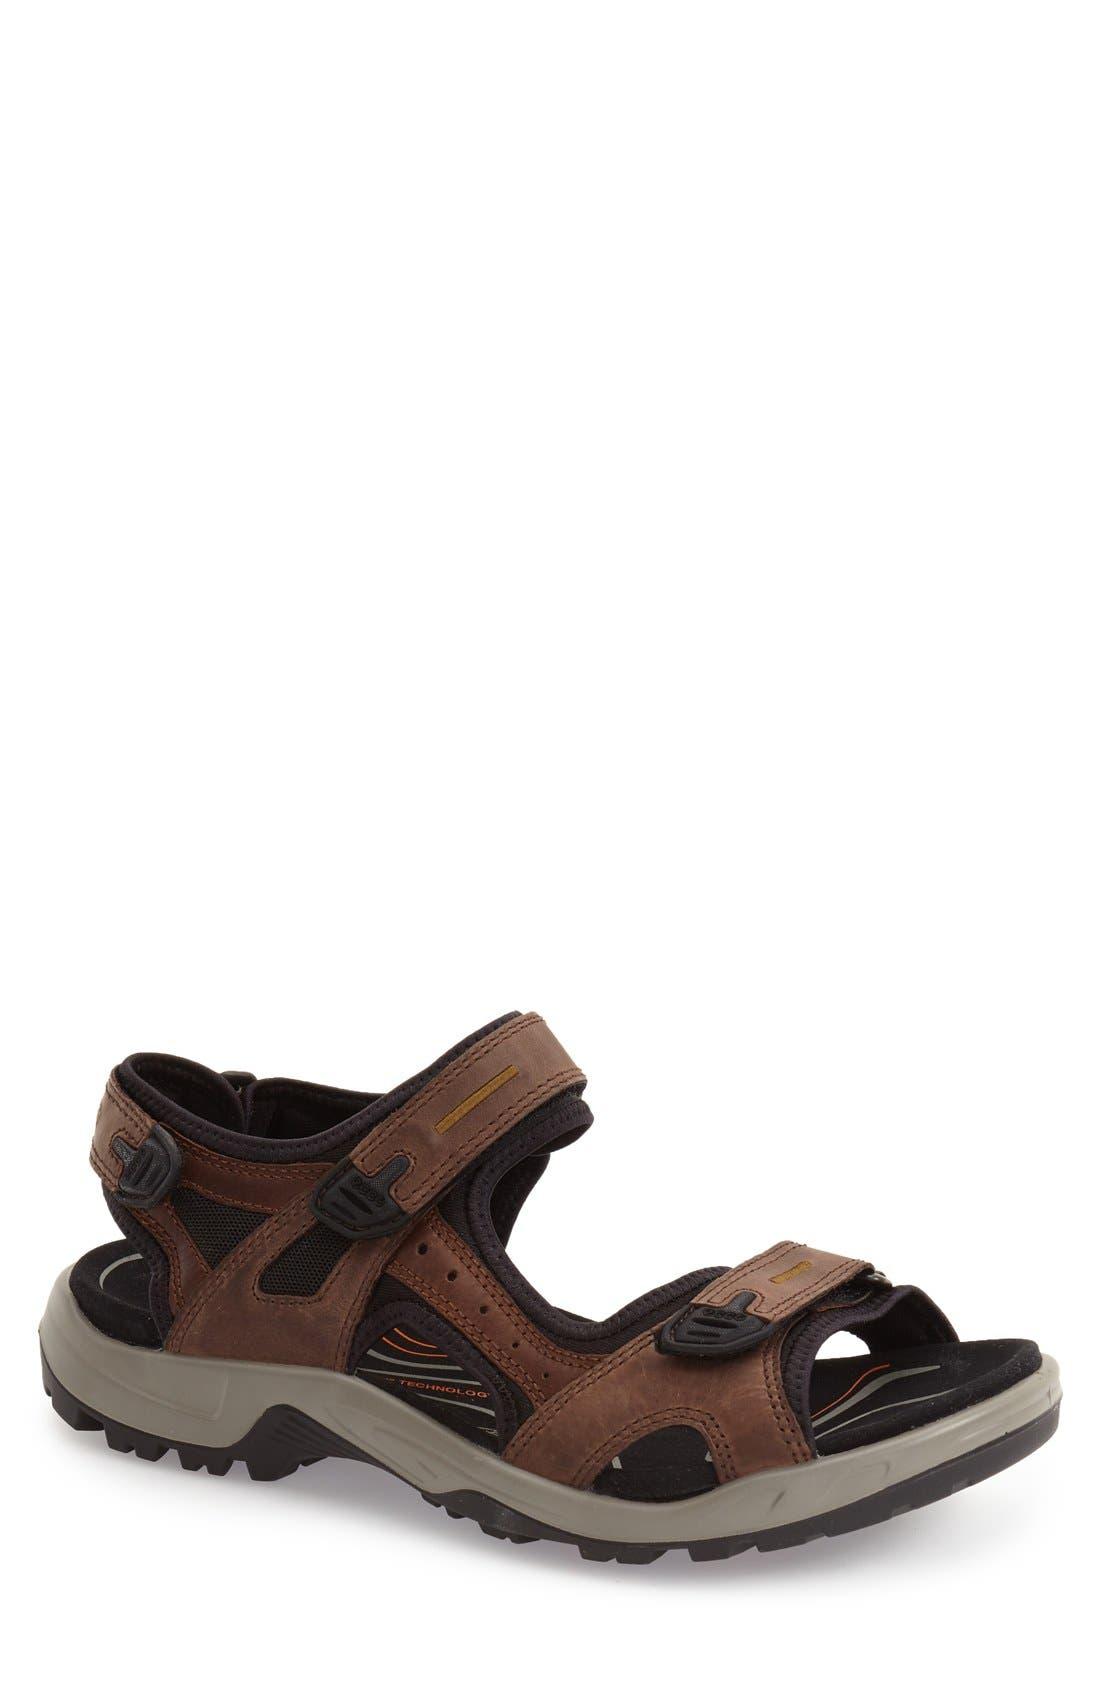 ECCO Men's Ecco 'Yucatan' Sandal, Size 12-12.5US - Brown